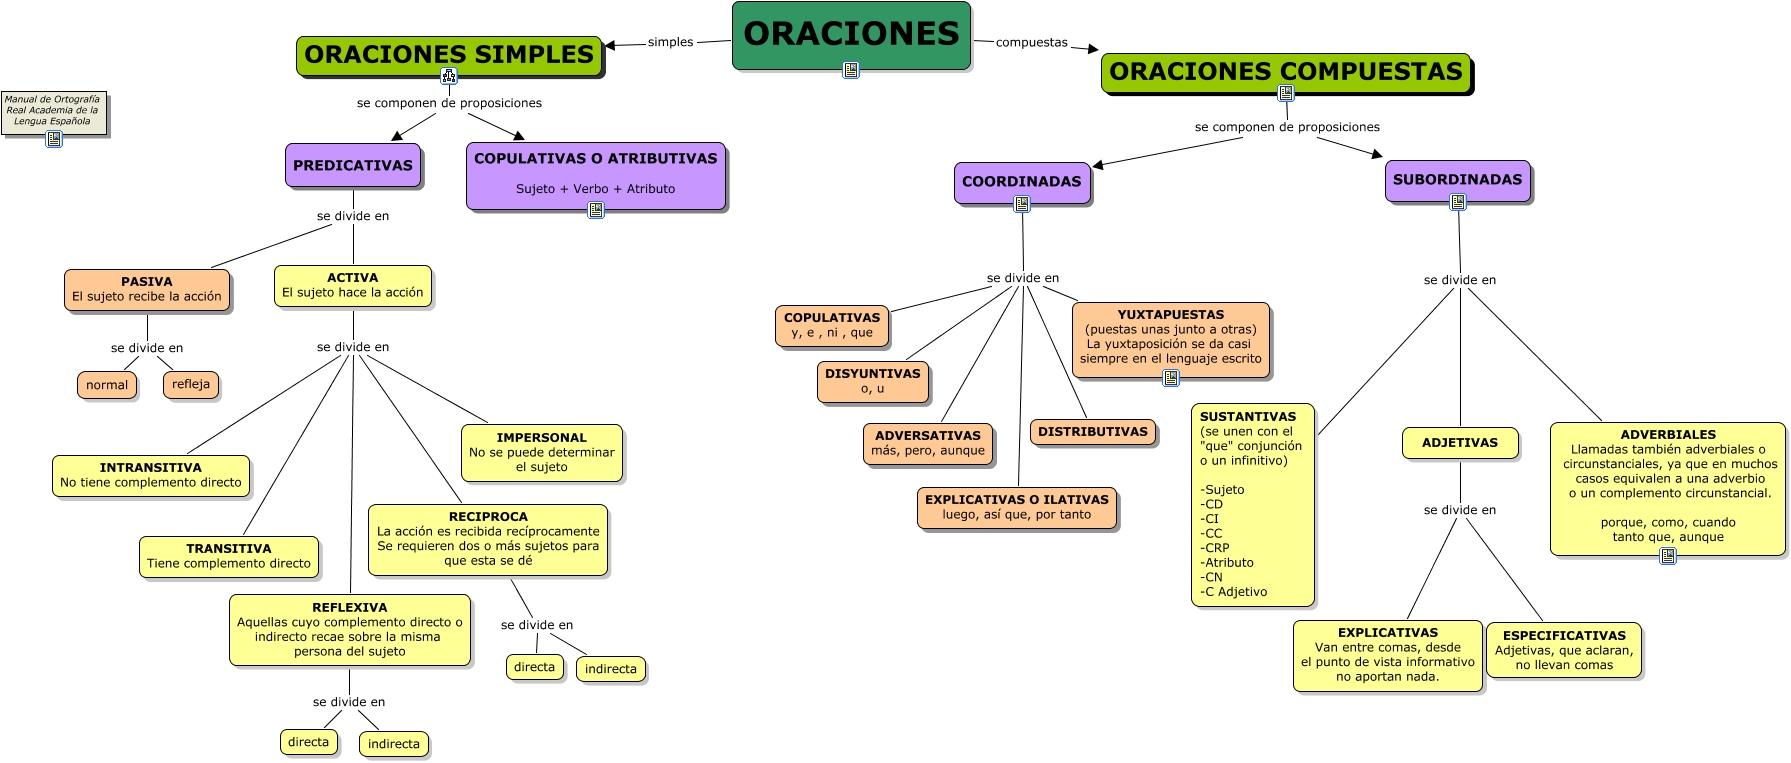 https://i0.wp.com/cuadrocomparativo.org/wp-content/uploads/2015/09/Oraciones.cmap_.jpeg